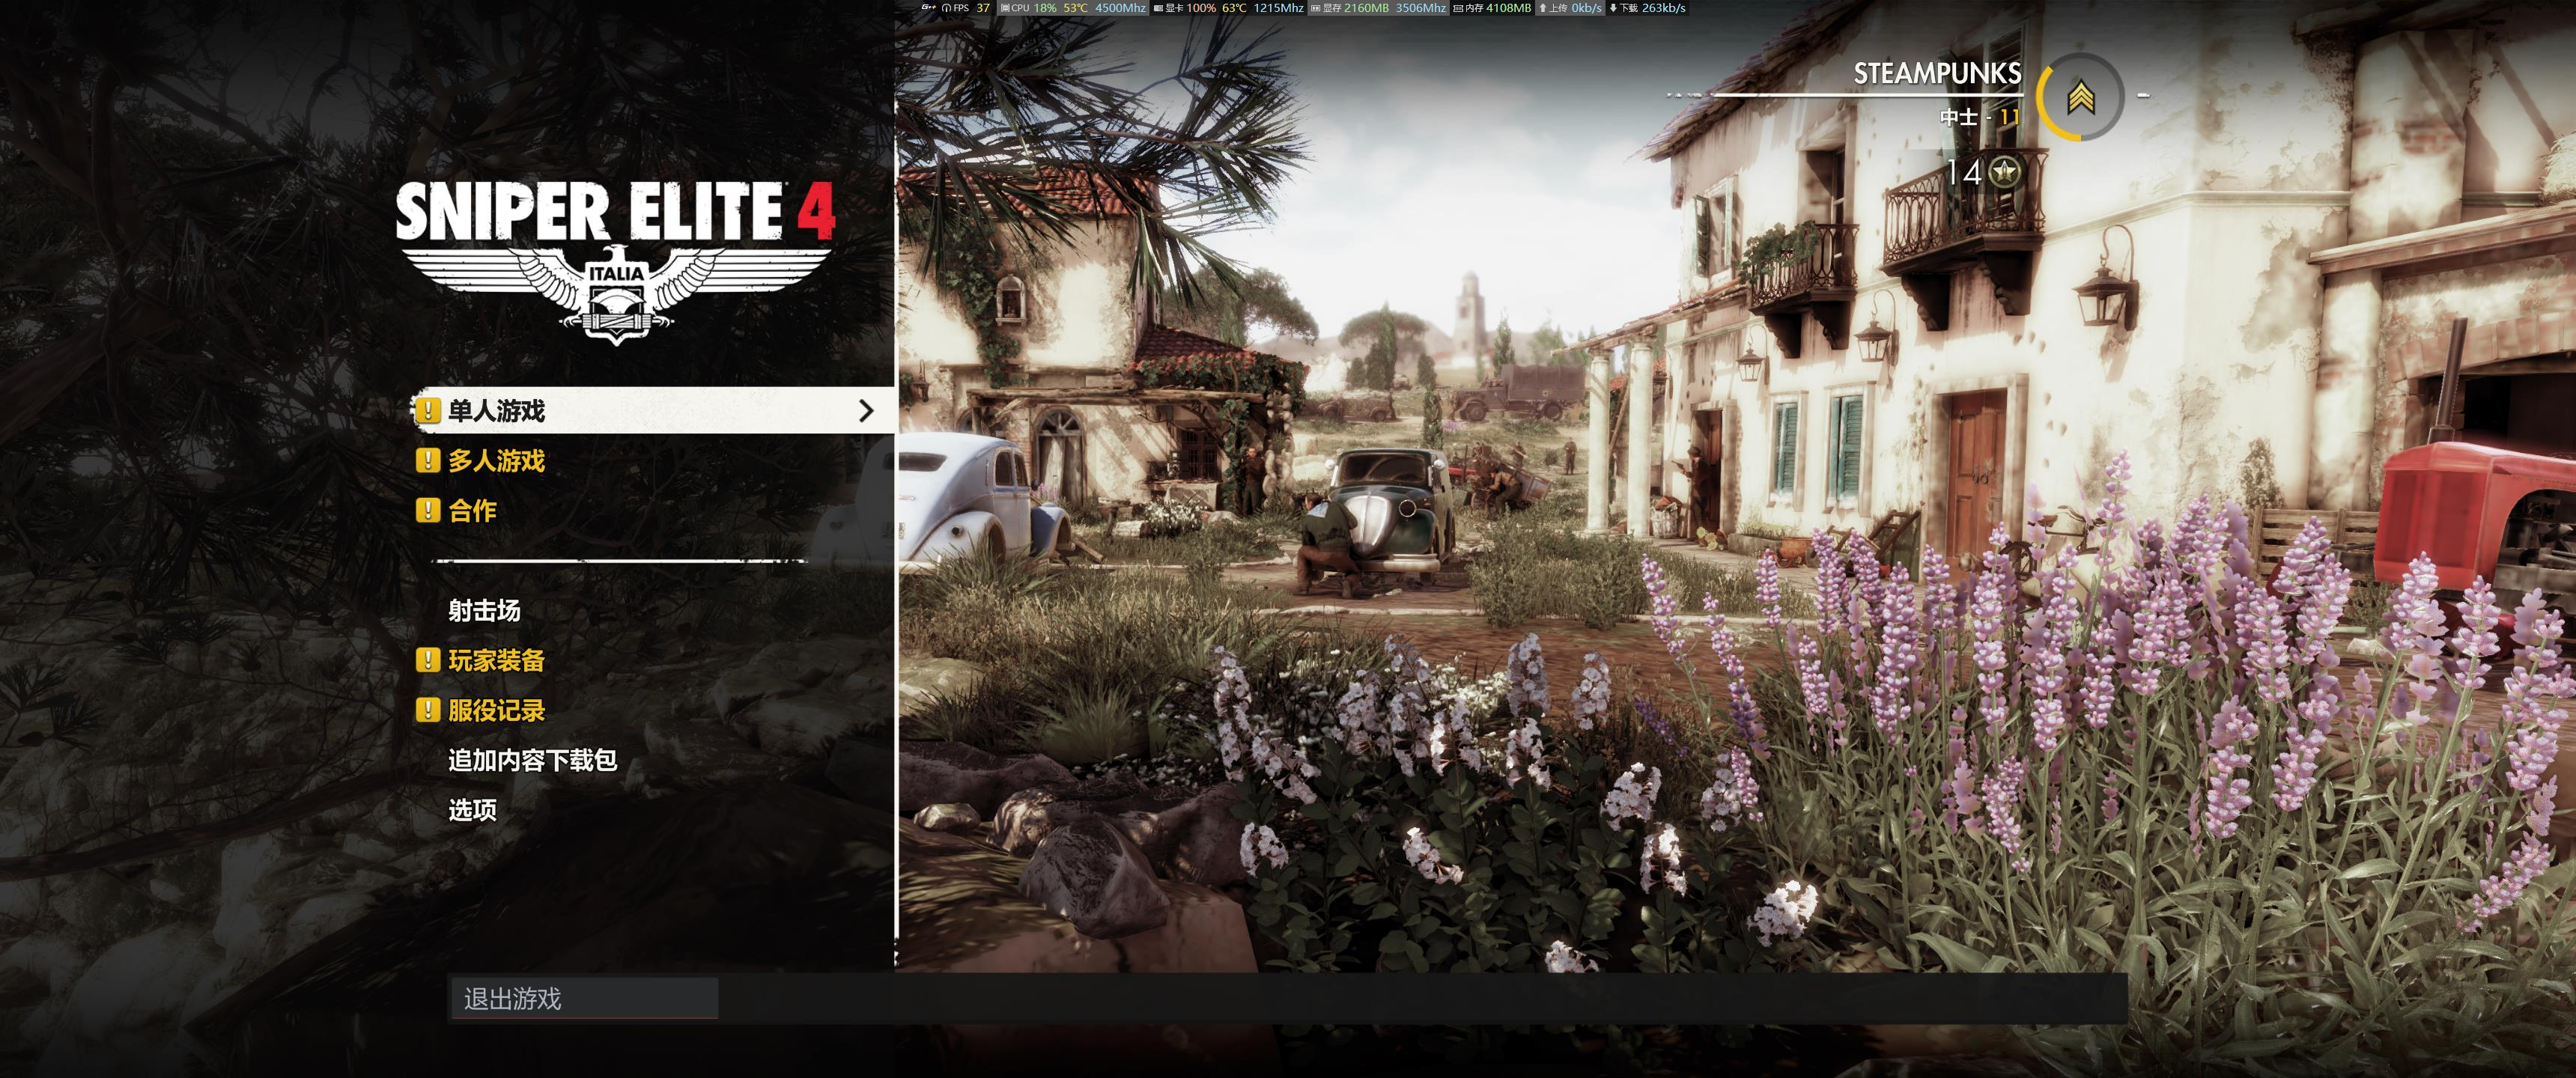 SniperElite4_DX11-01-20-33-35.jpg